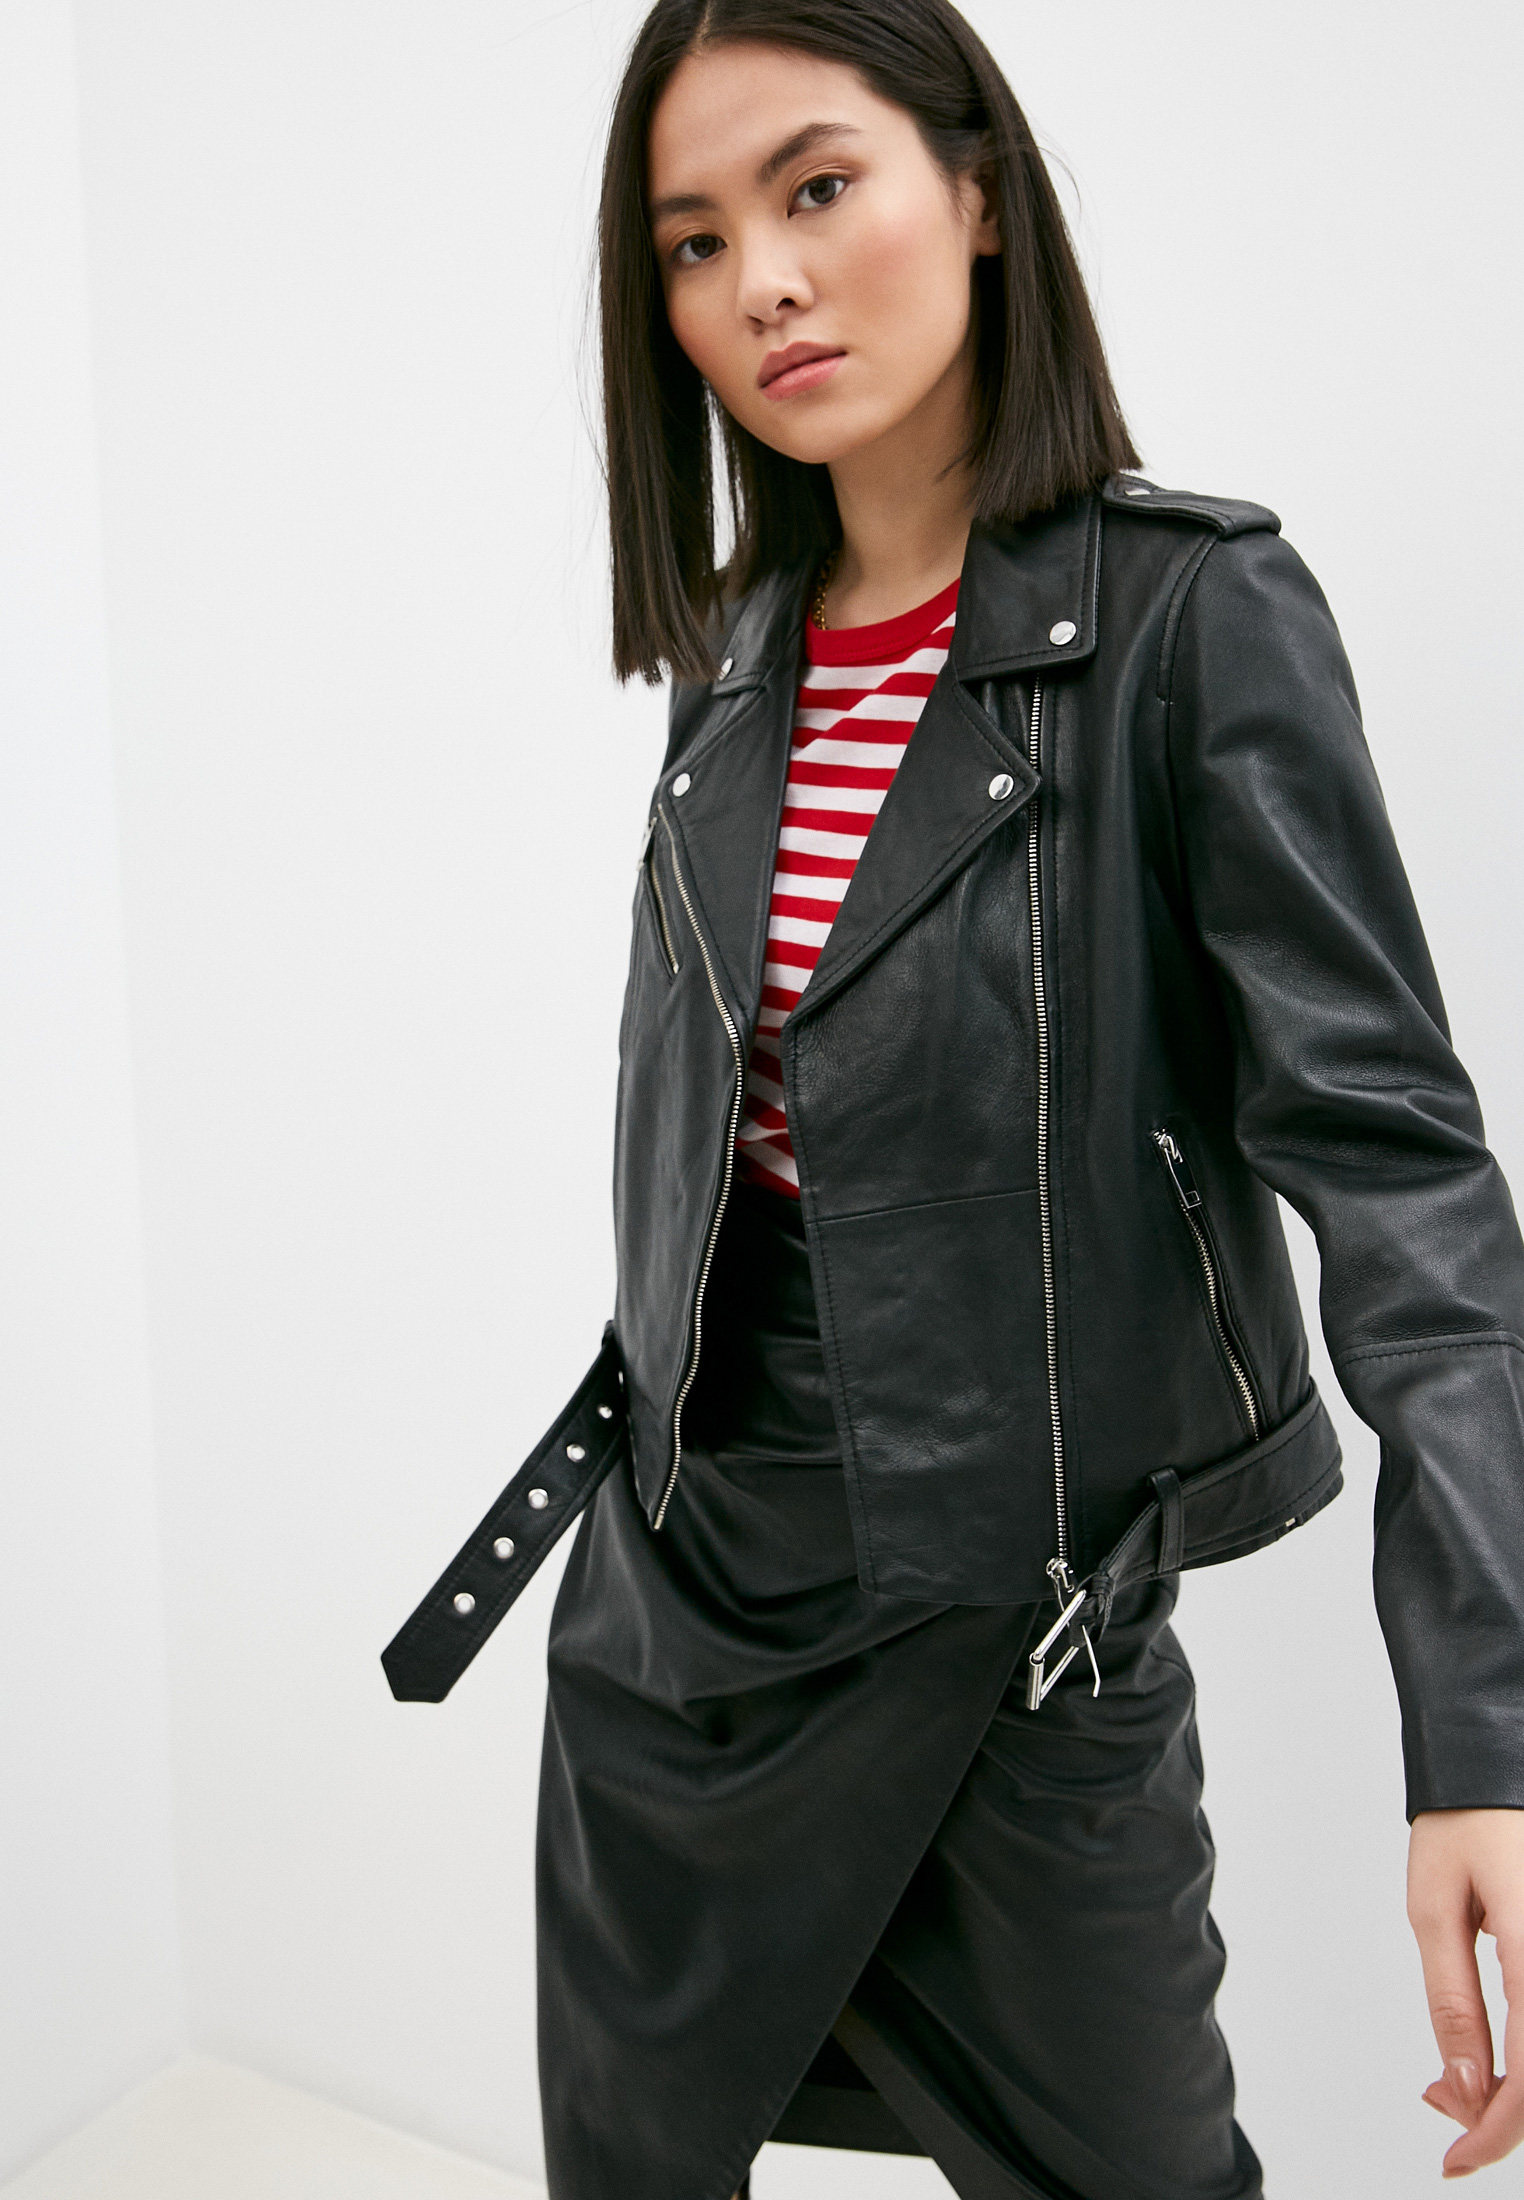 Кожаная куртка Serge Pariente GIRLY